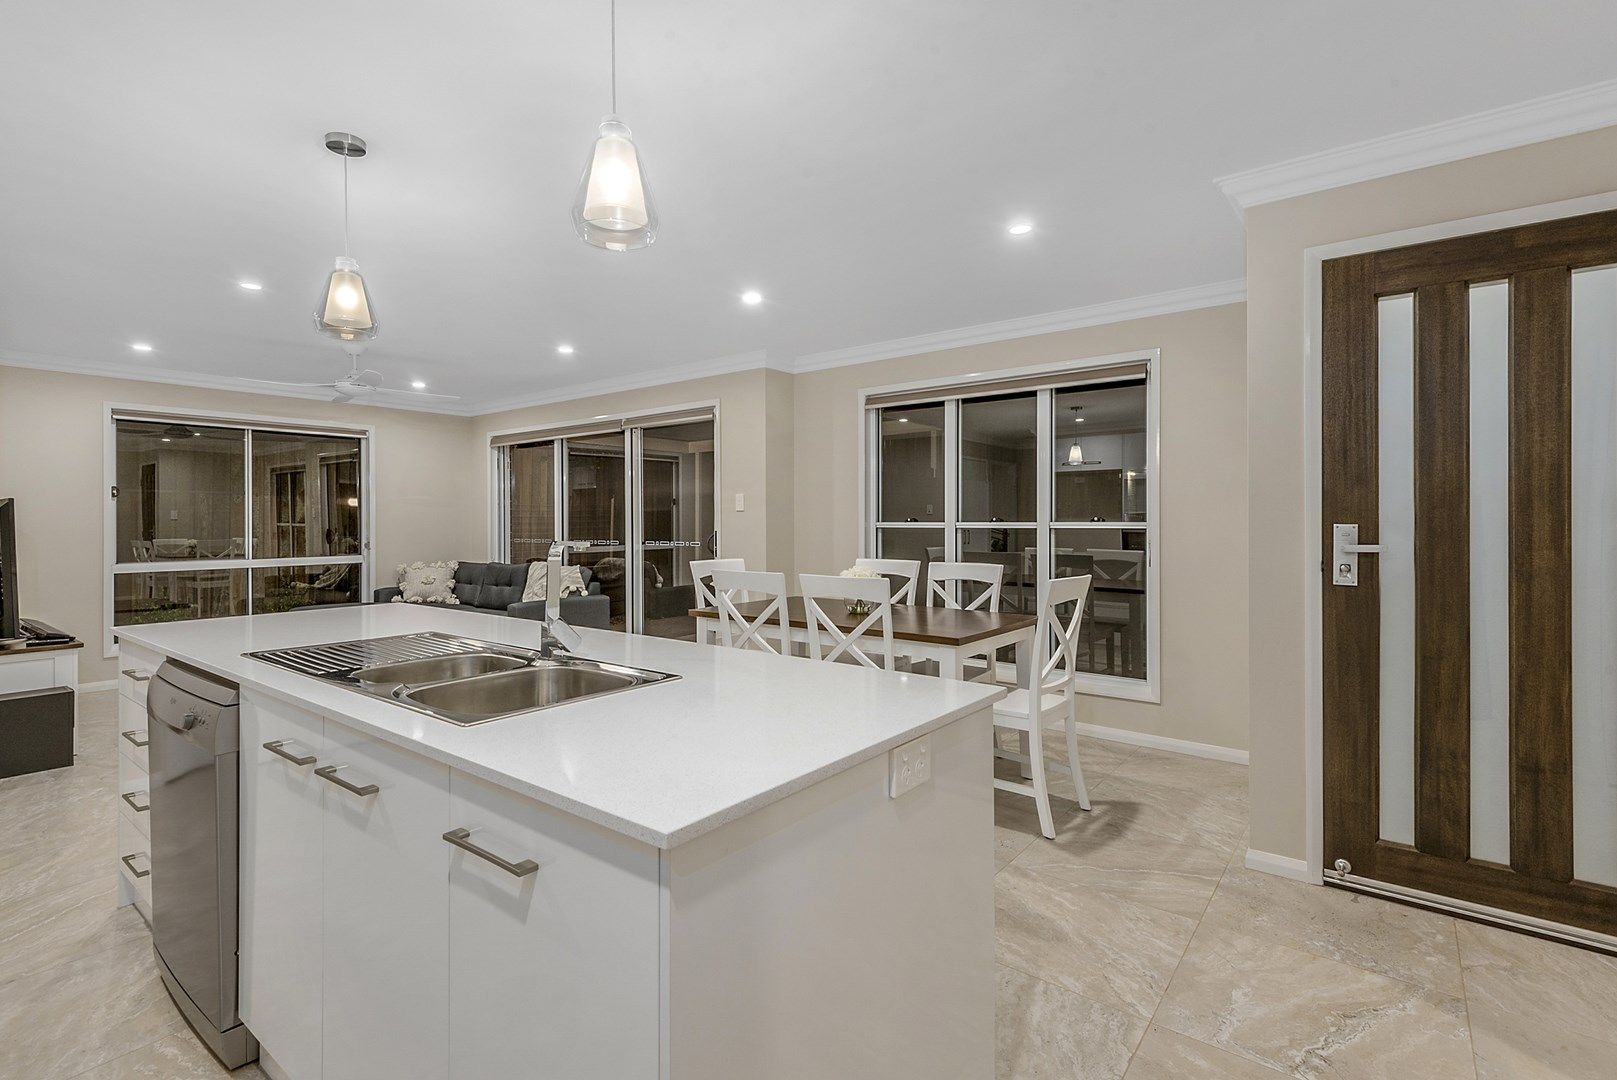 64A Holberton Street, Rockville QLD 4350, Image 2